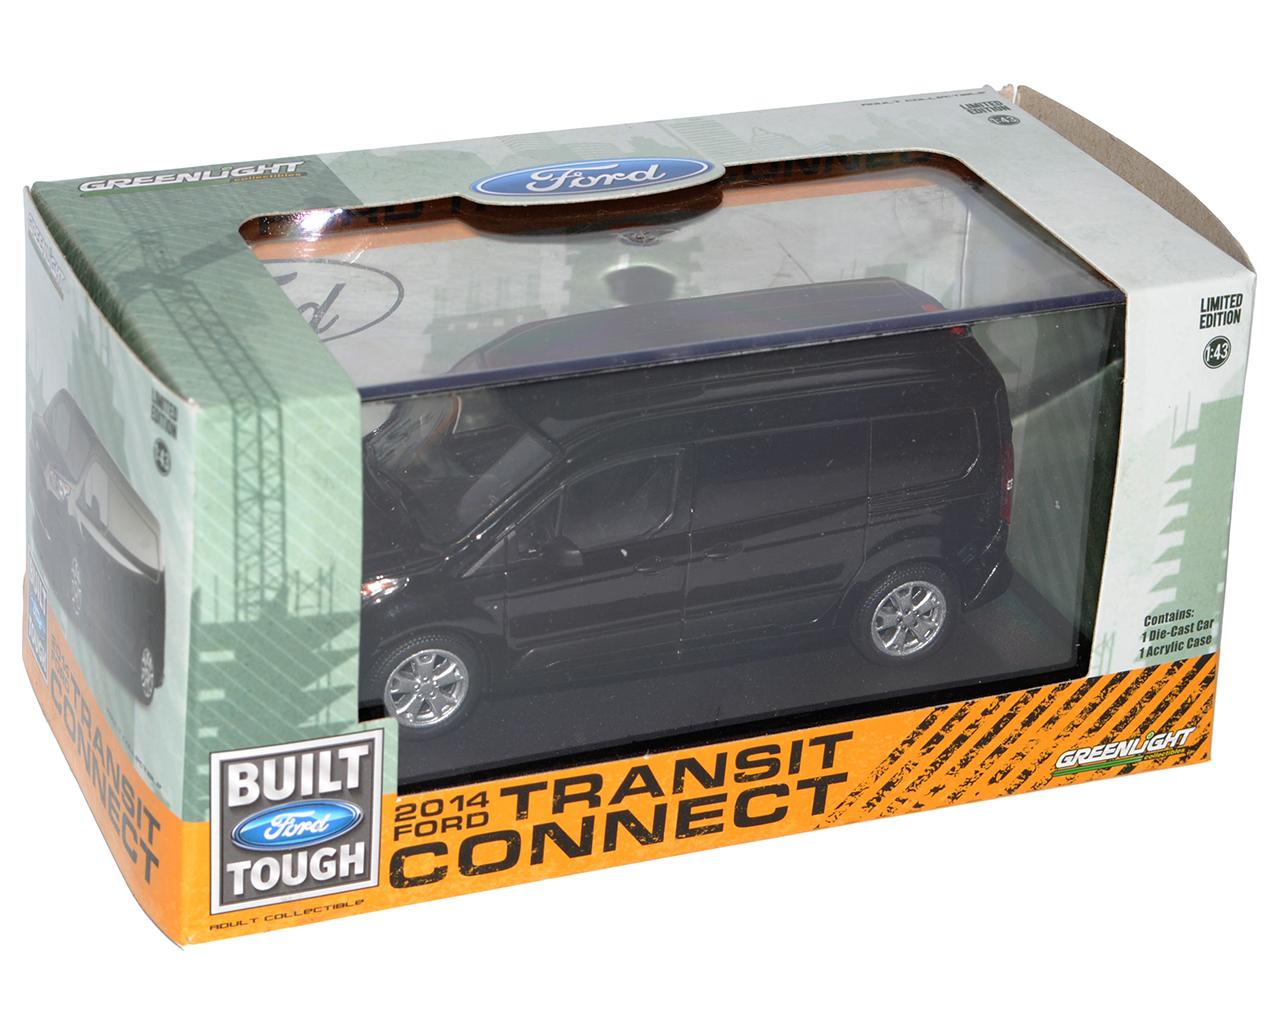 Ford Transit Connect furgonetas Kasten Schwarz de 2013 2ª generación 1//43 GRE...